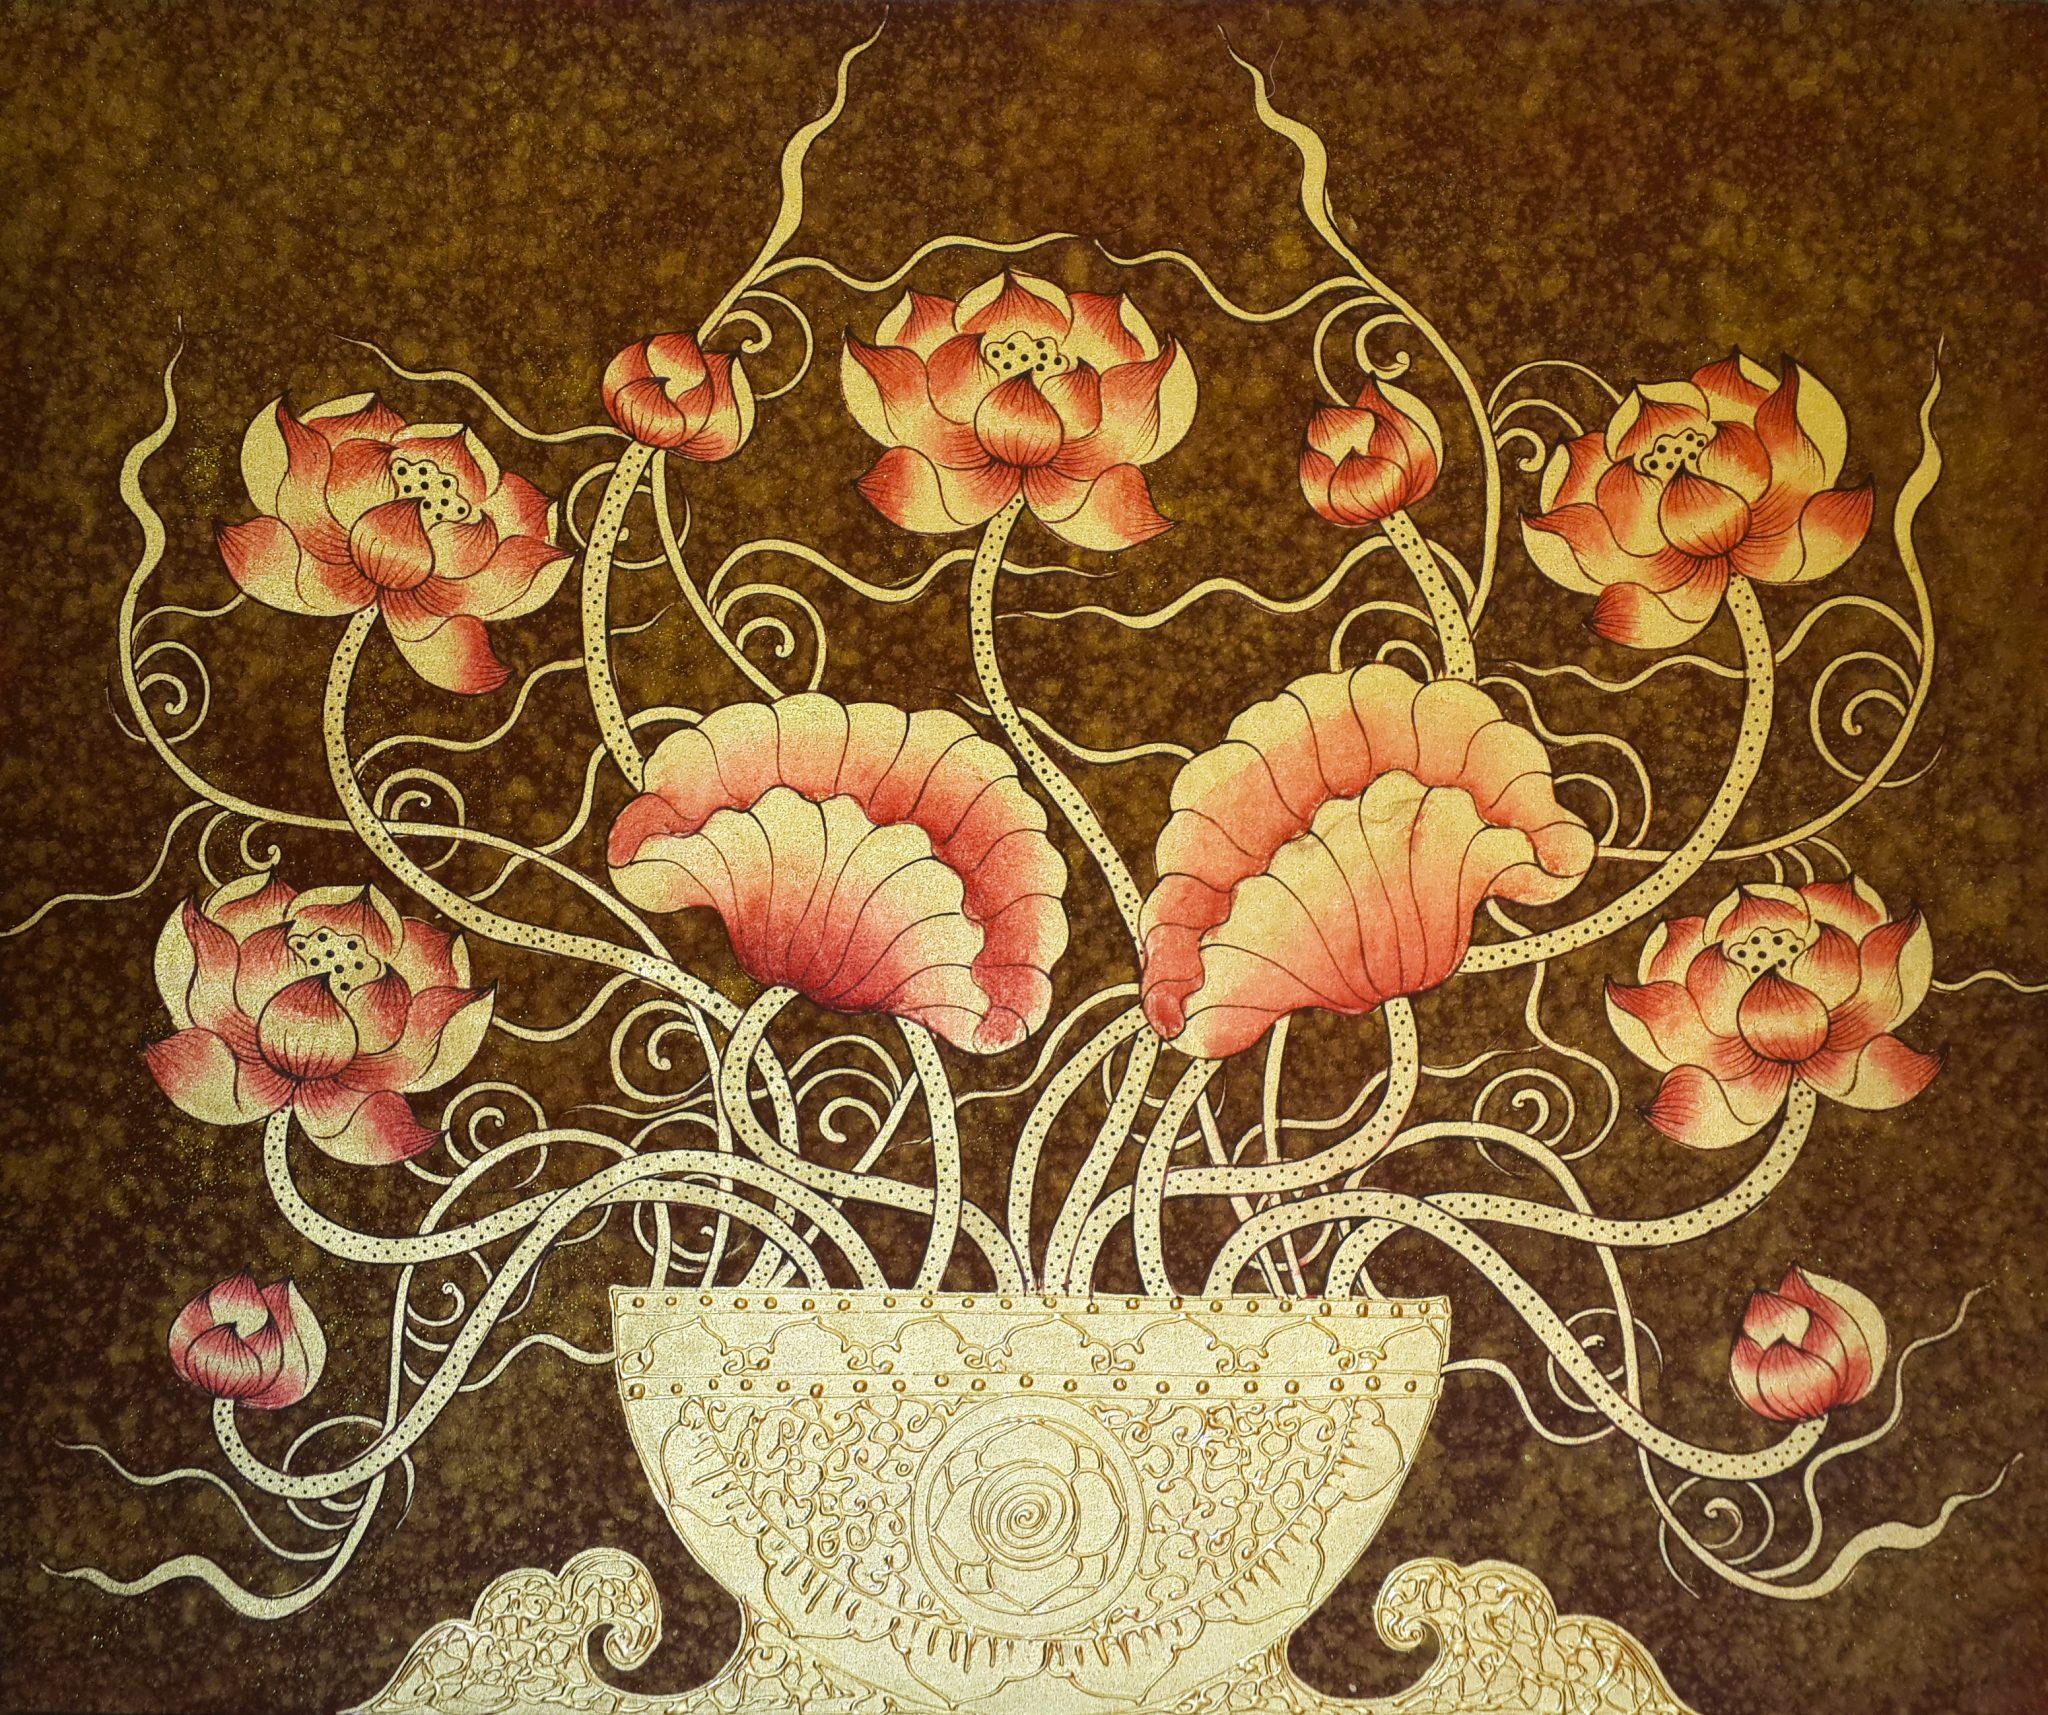 Lotus Wall Decor Exclusive Thai Paintings Designs Royal Thai Art